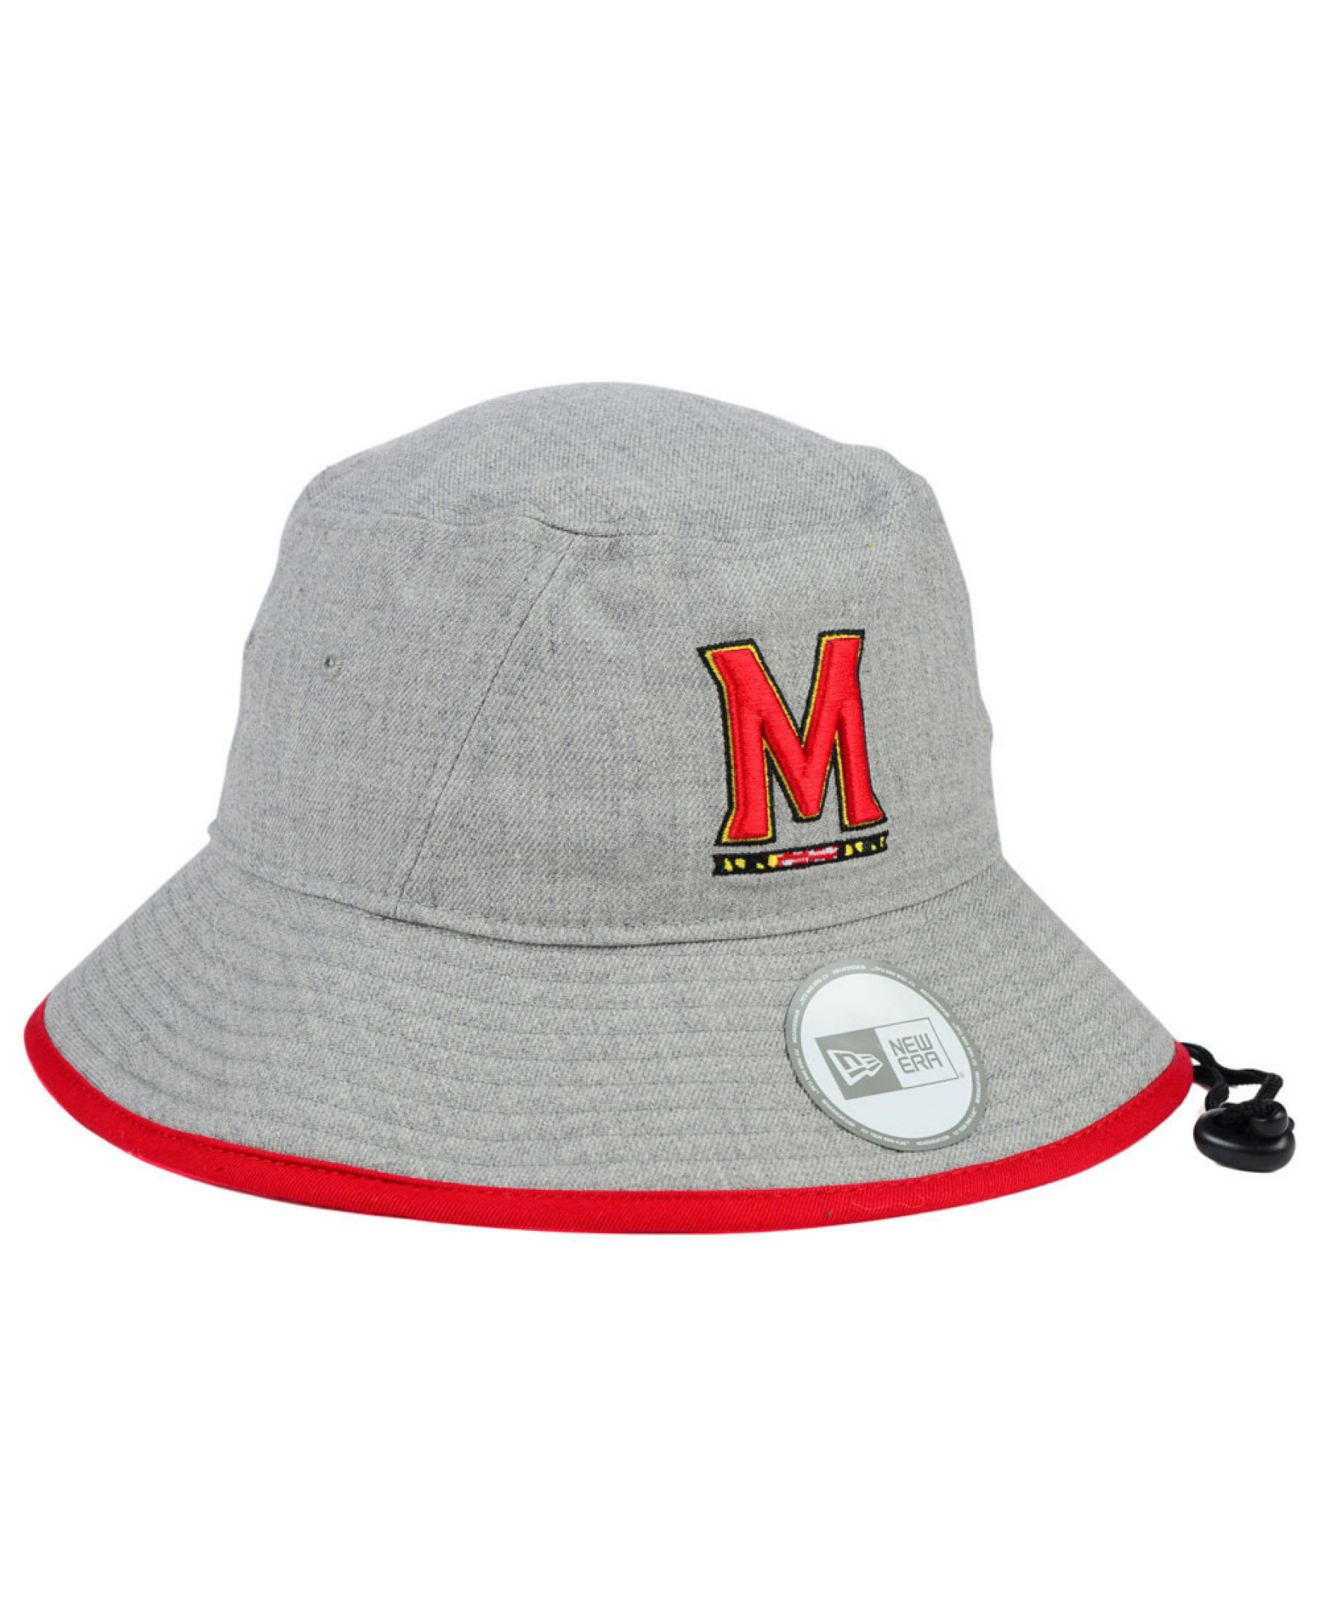 fdb3227949c Lyst - KTZ Maryland Terrapins Tip Bucket Hat in Gray for Men